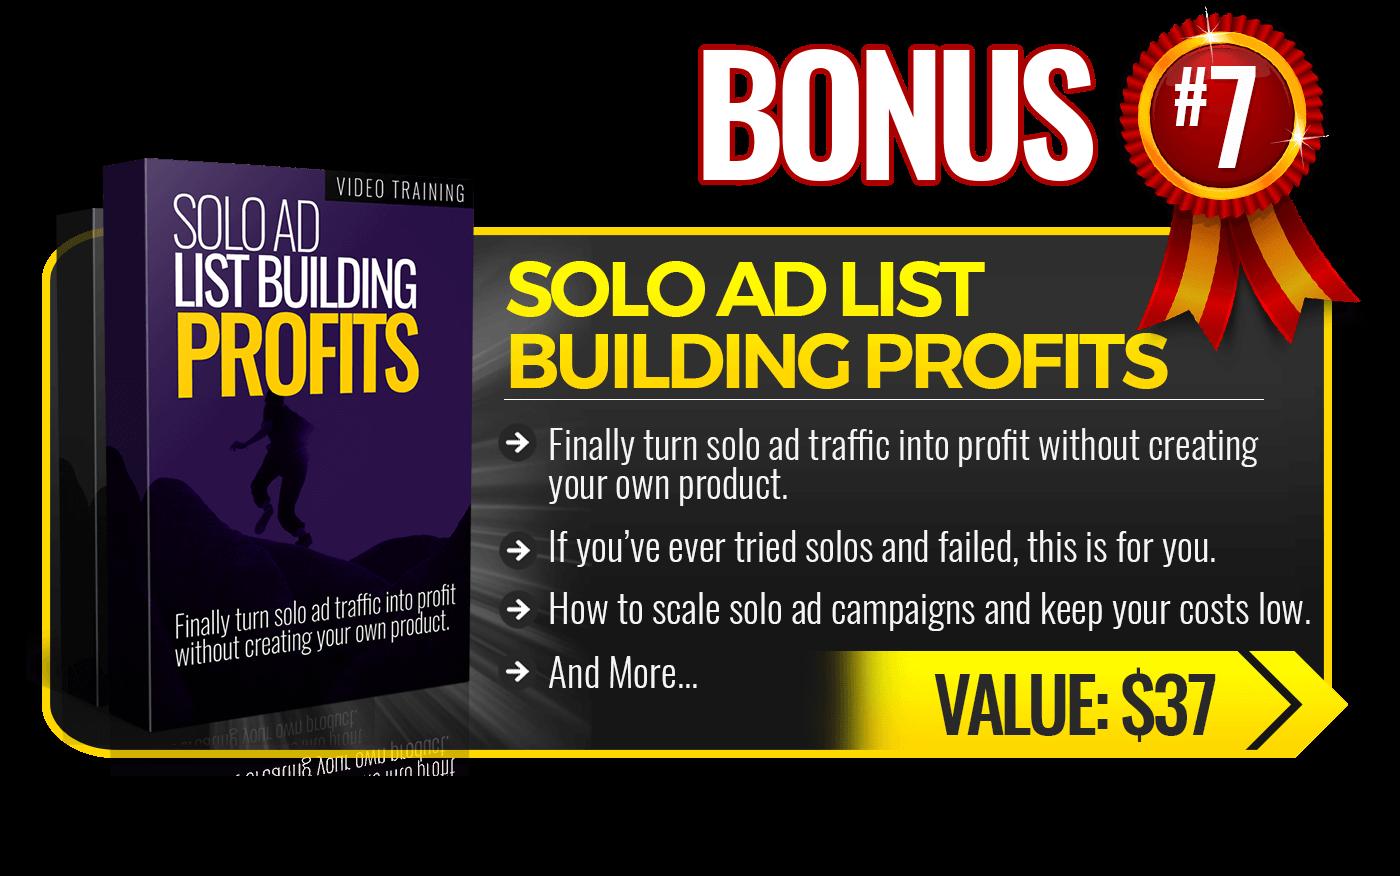 7. Solo Listing Building Profits